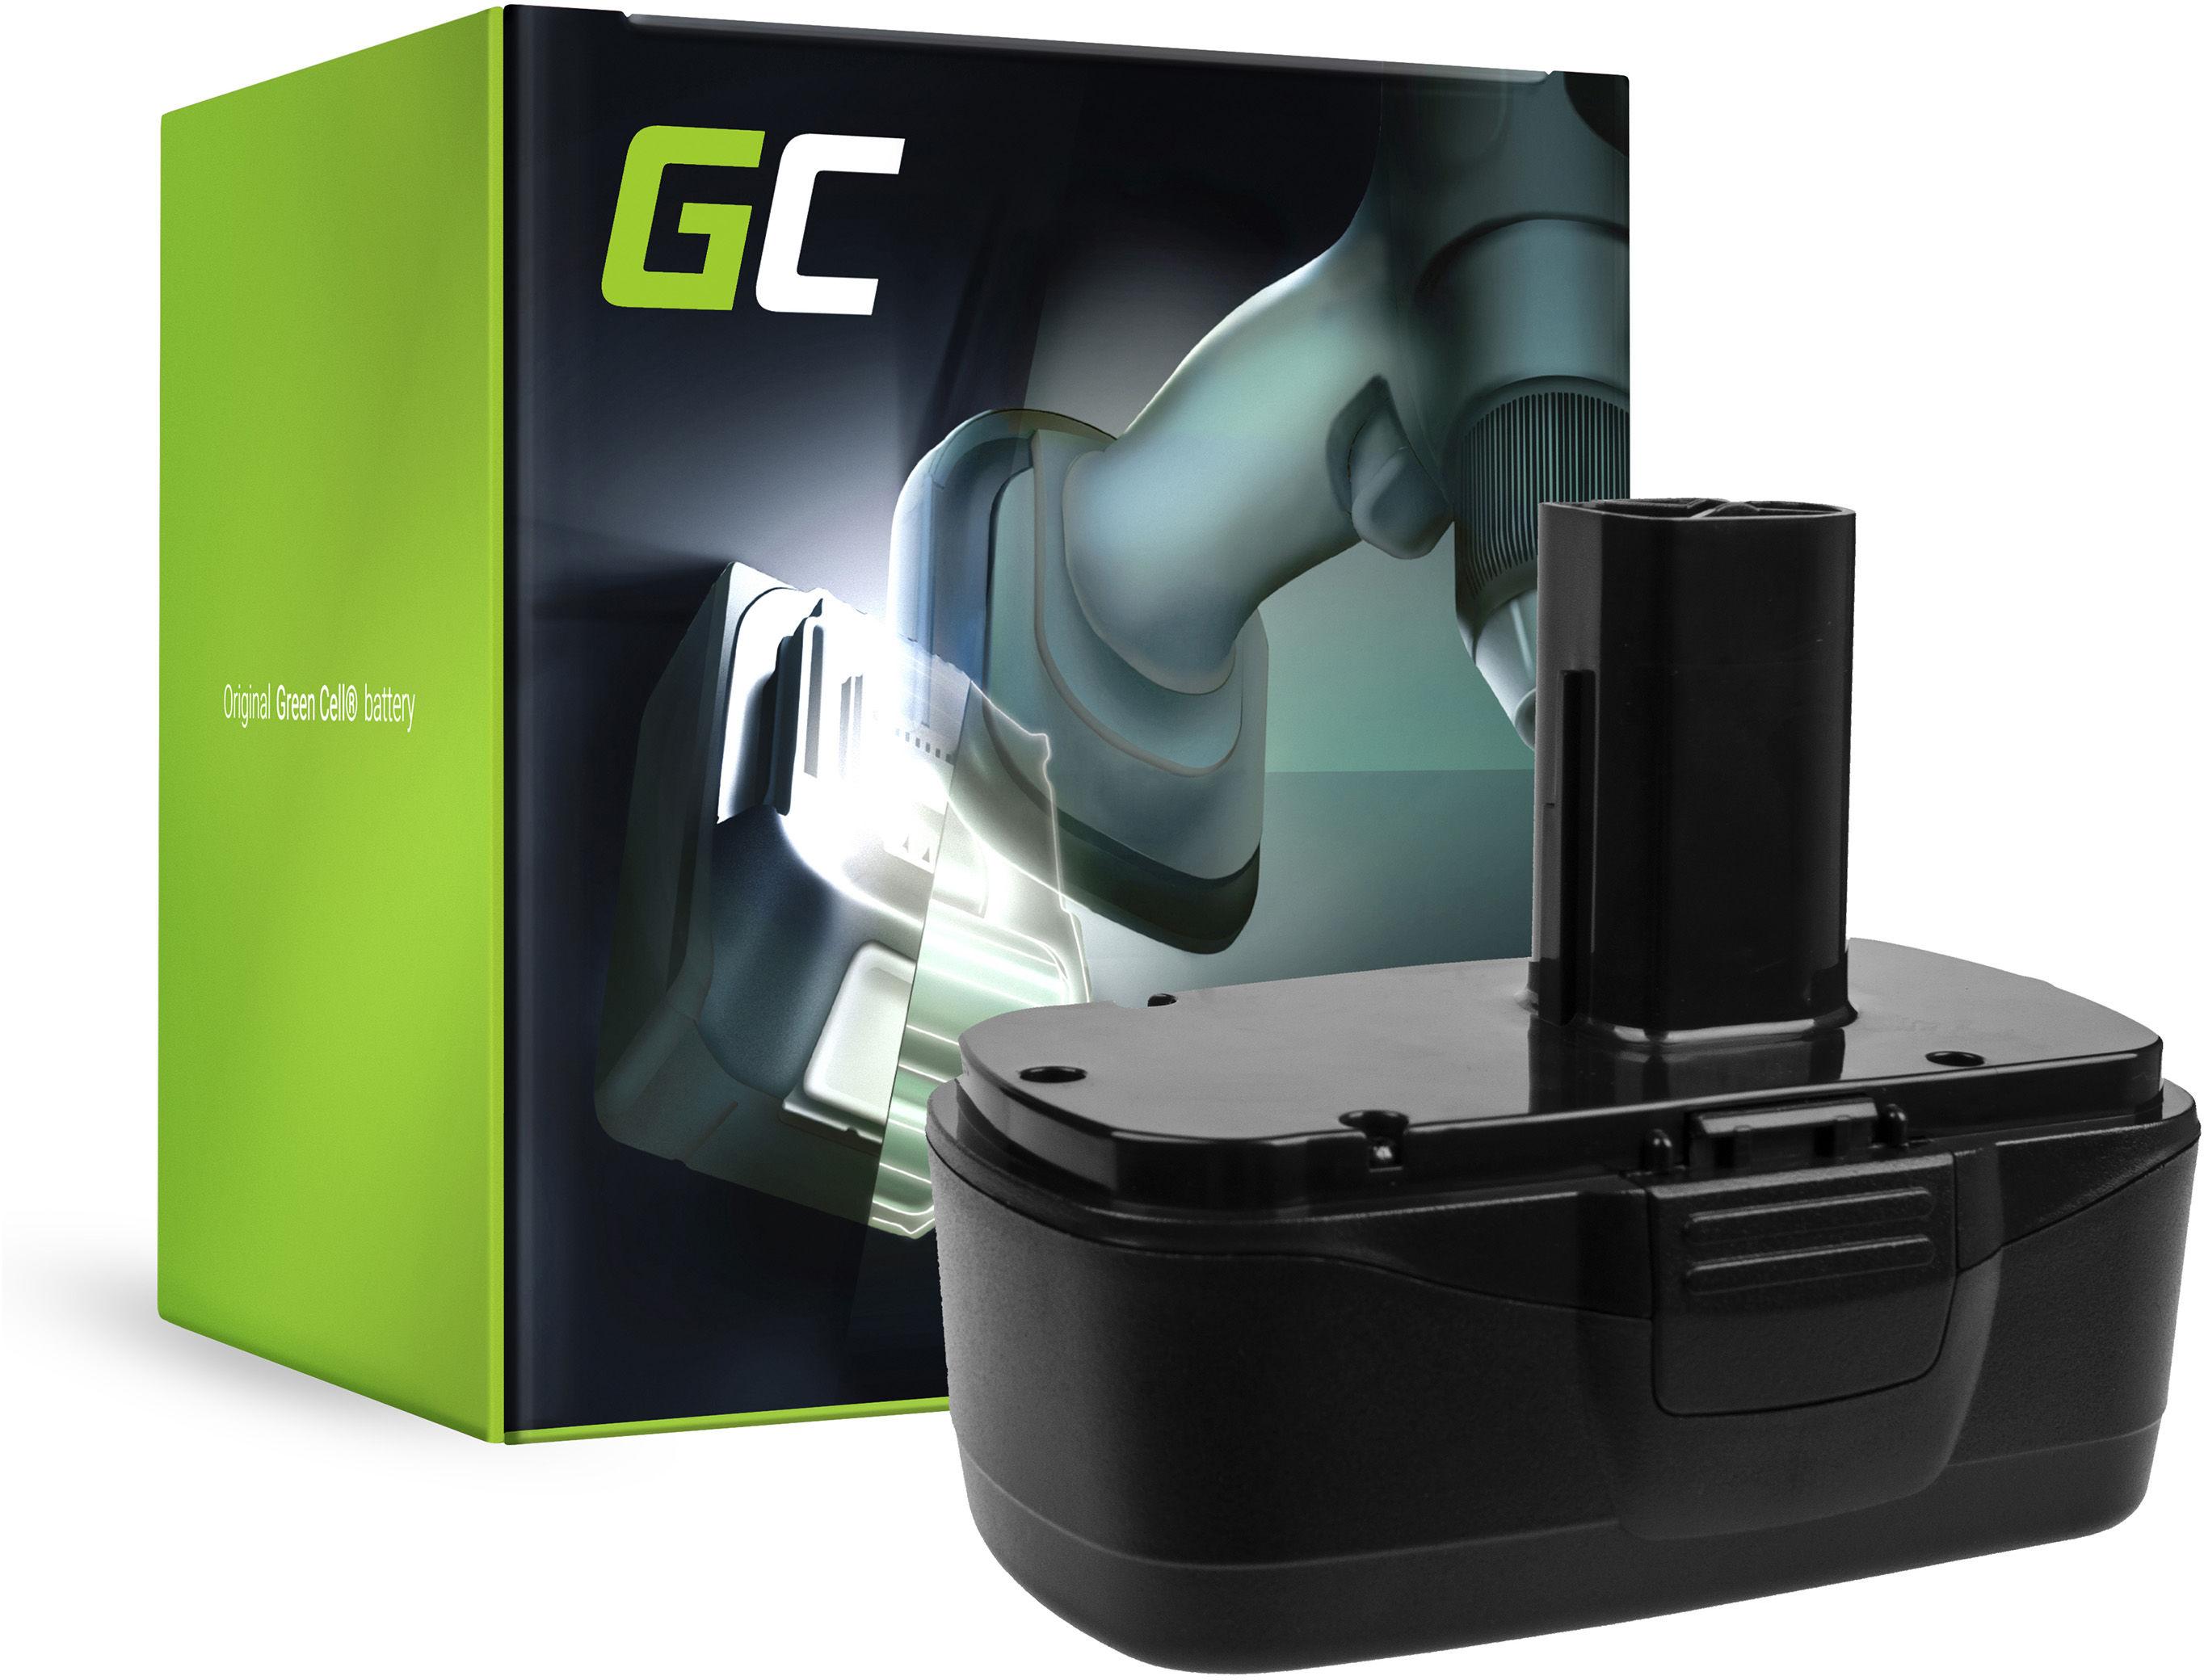 Bateria Green Cell (3Ah 19.2V) 11375 11376 do Craftsman C3 XCP 19.2V CRS1000 ID2030 11485 114850 114852 115410 17191 5727.1